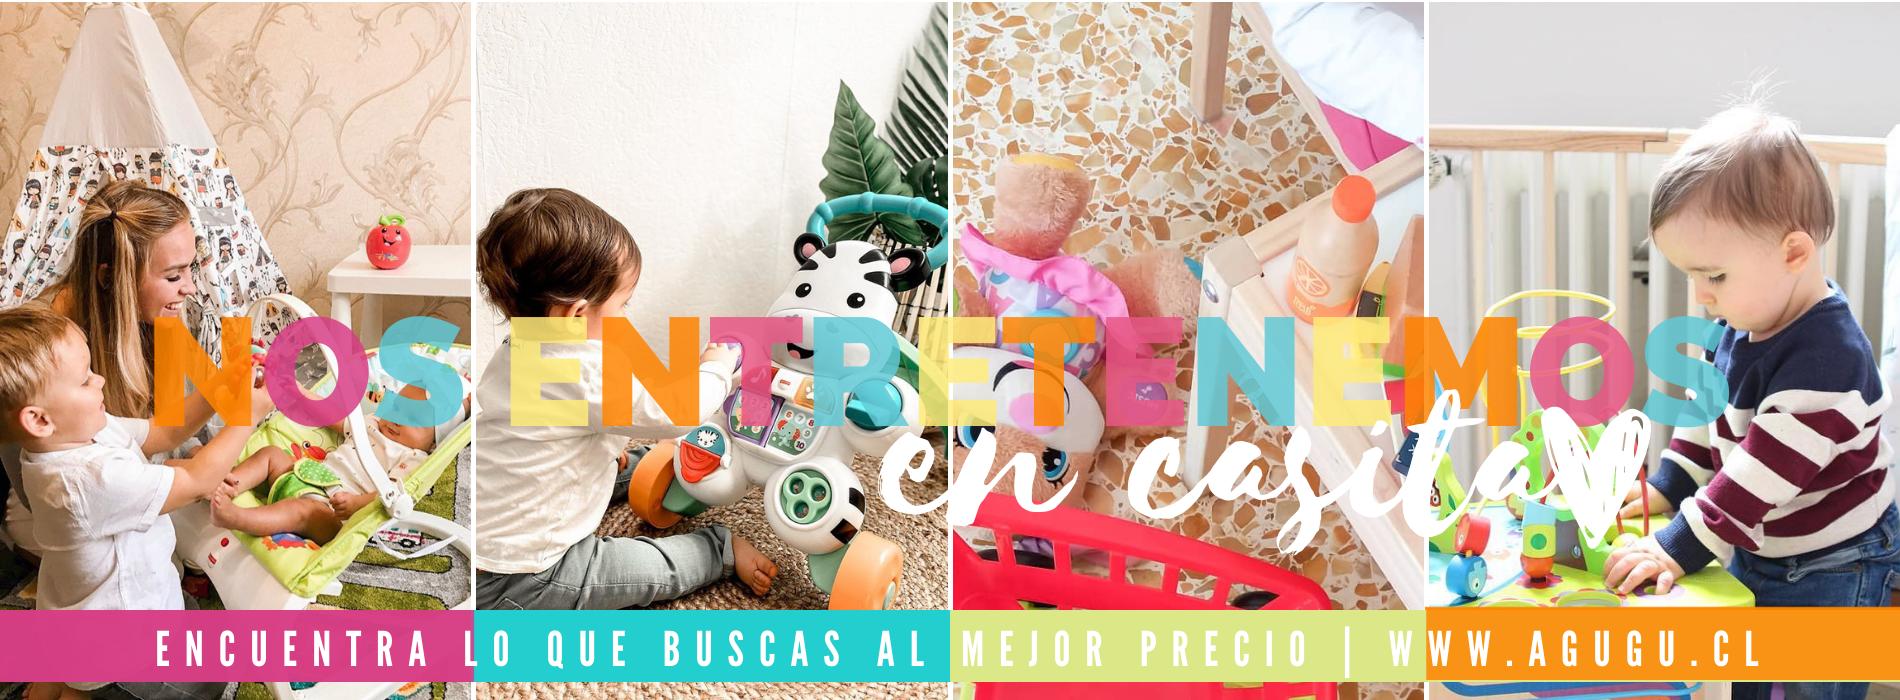 Agugú Baby Store